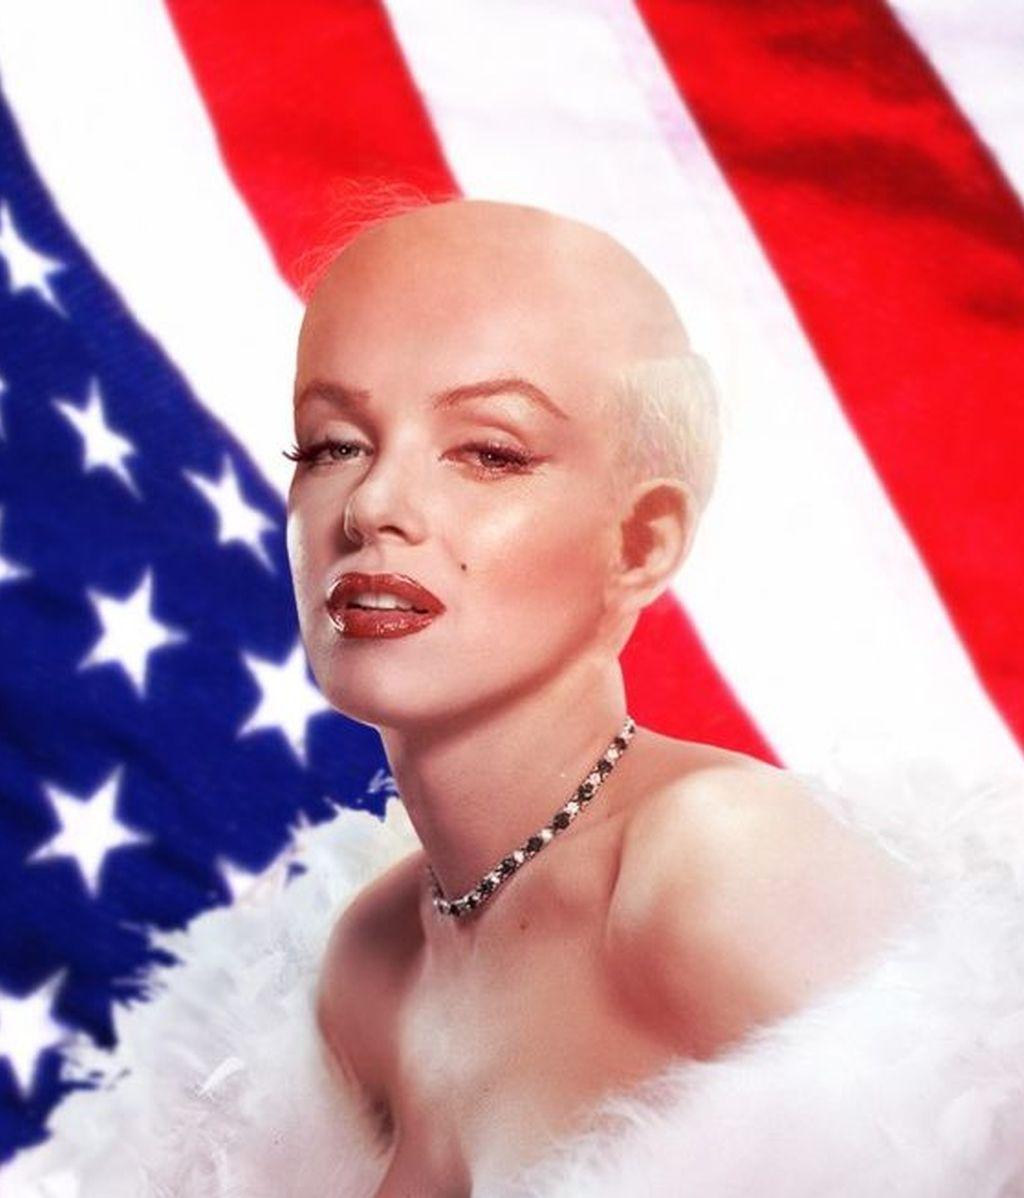 Imagina a Marilym Monroe